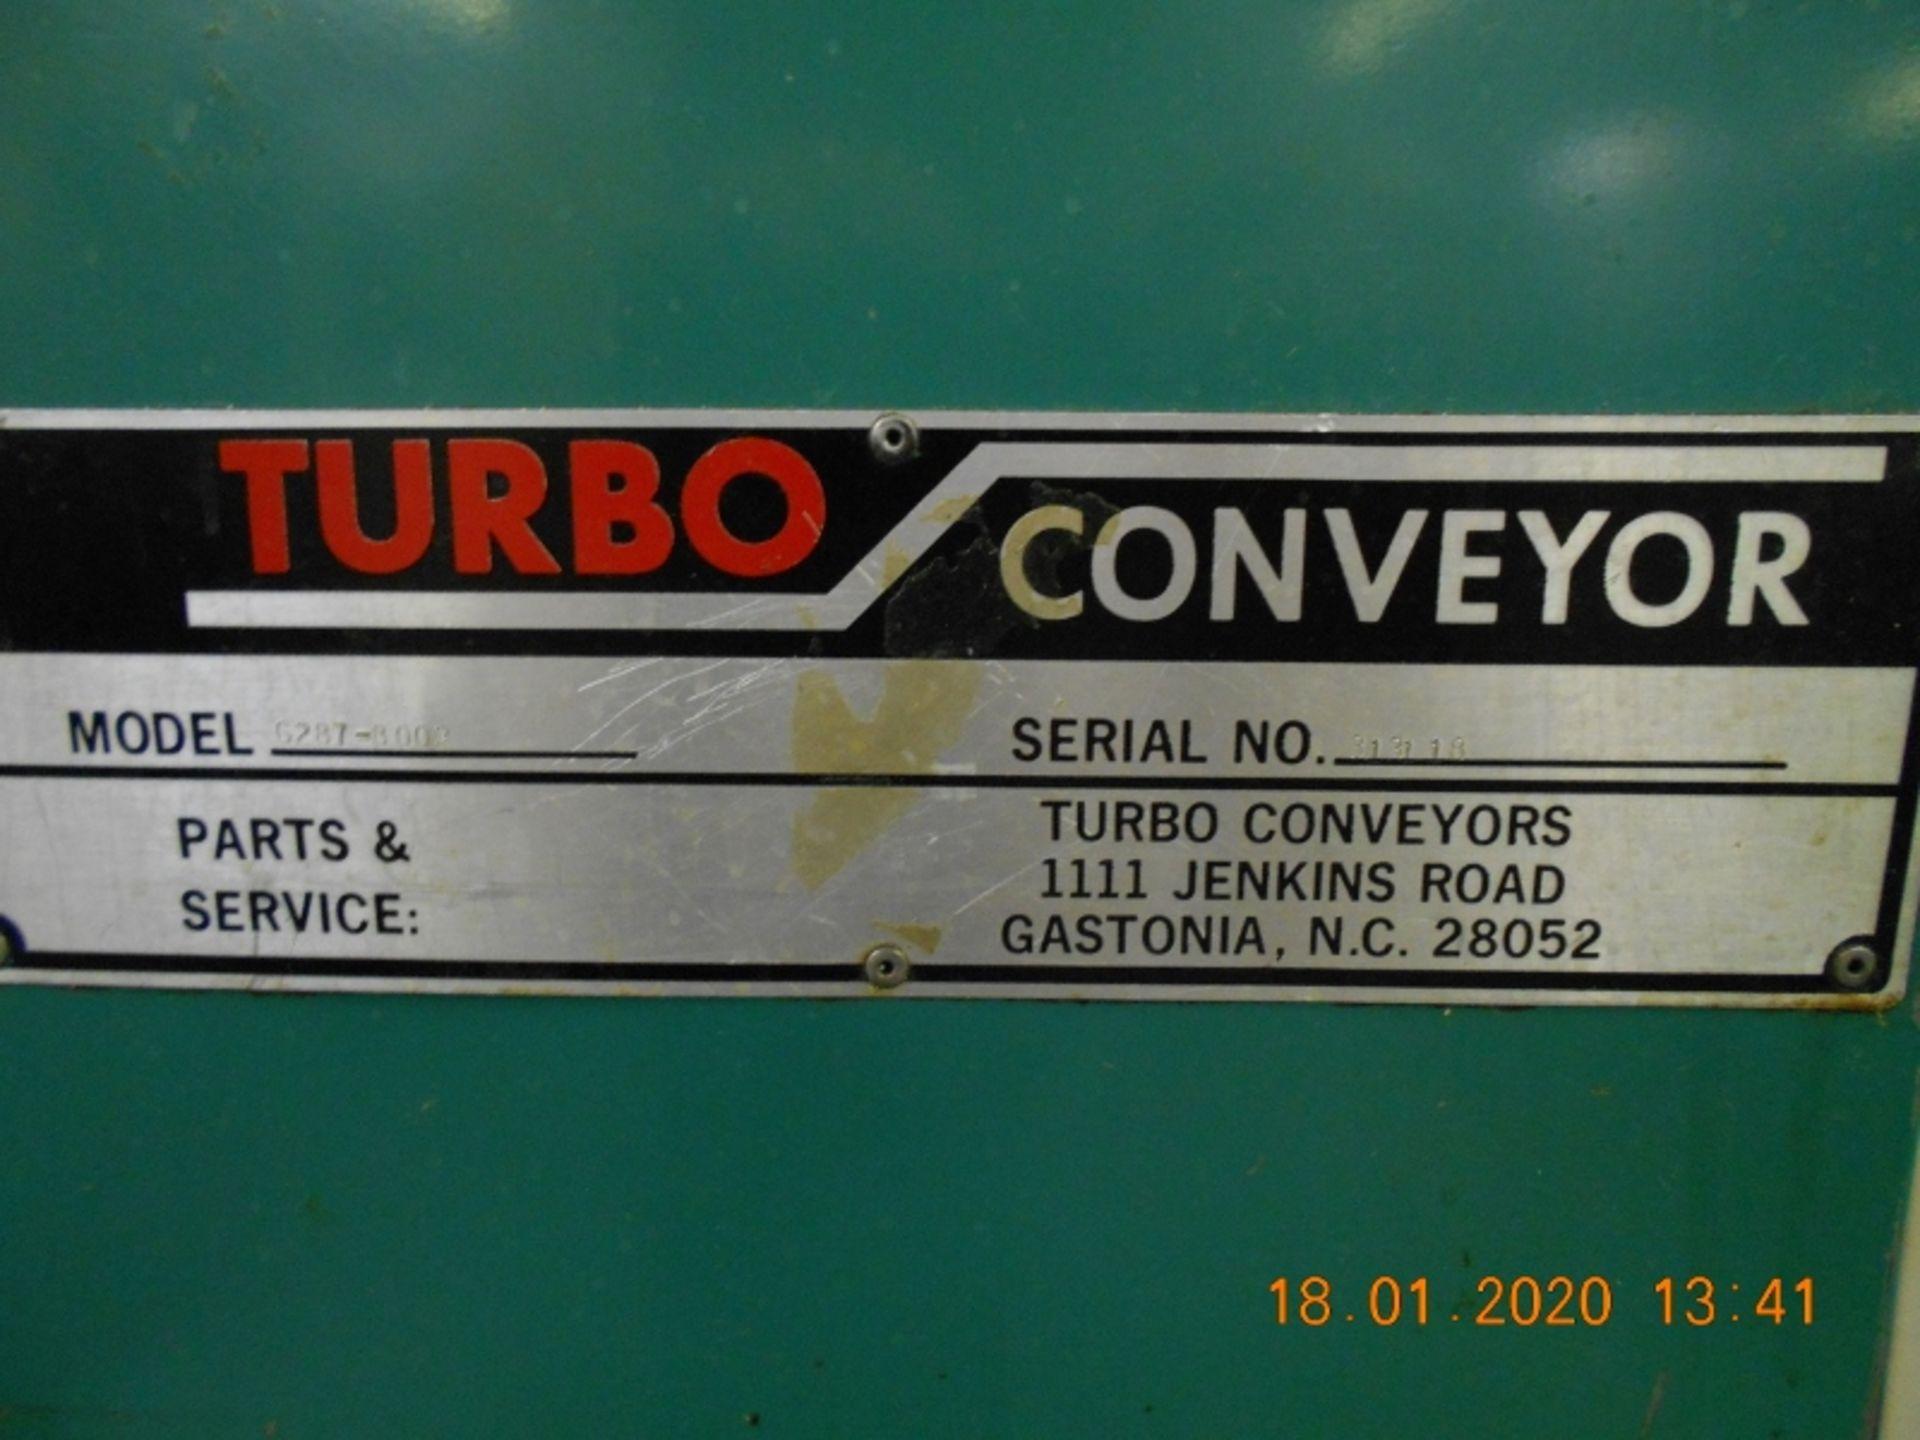 Lot 9 - Turbo 6287-8002 Incline Chip Conveyor Serial #313118